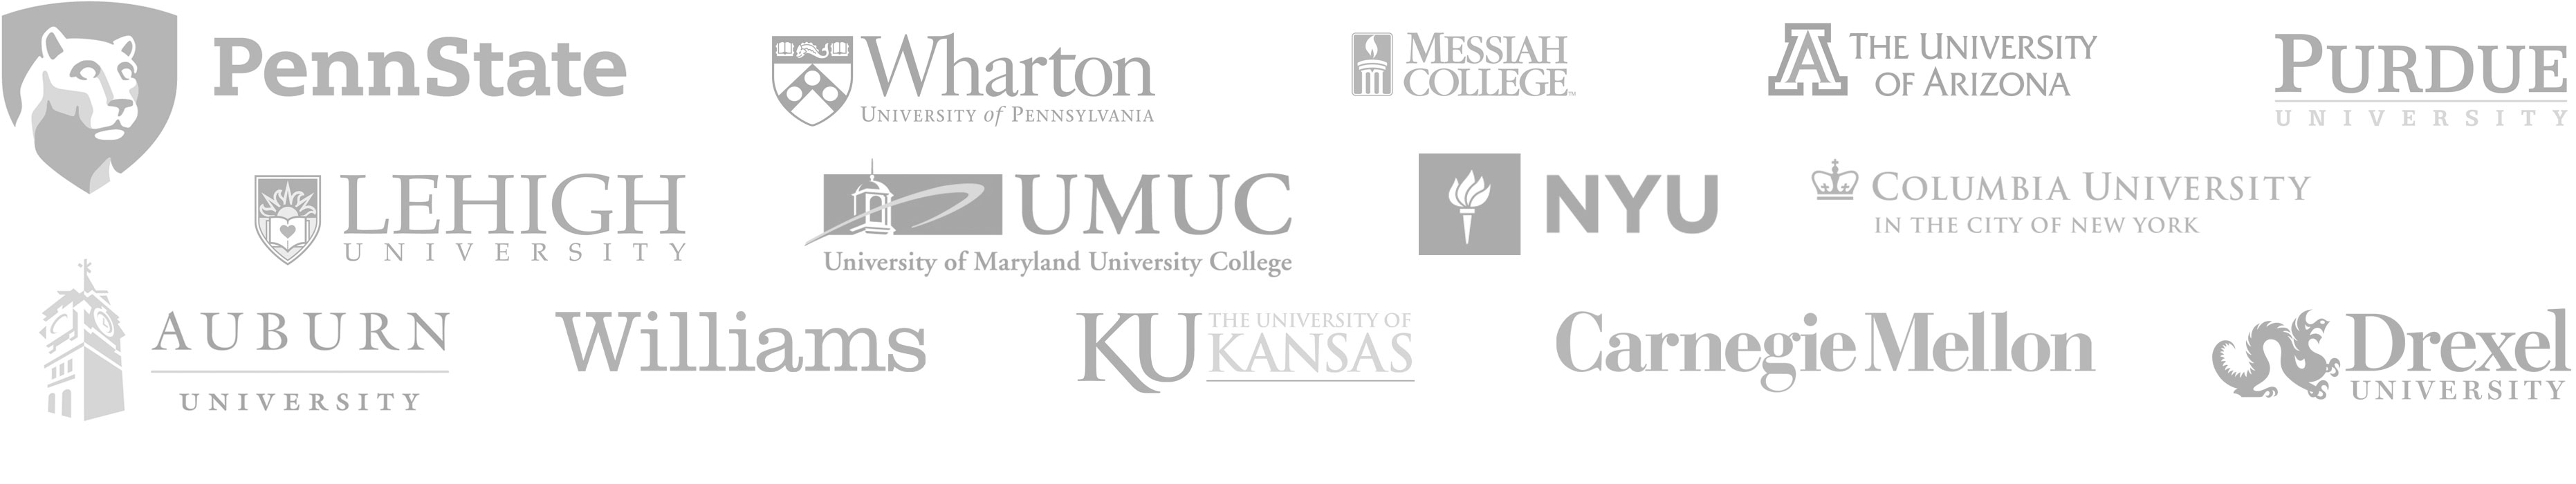 05_customer-logos-highered-universities-2016.jpg